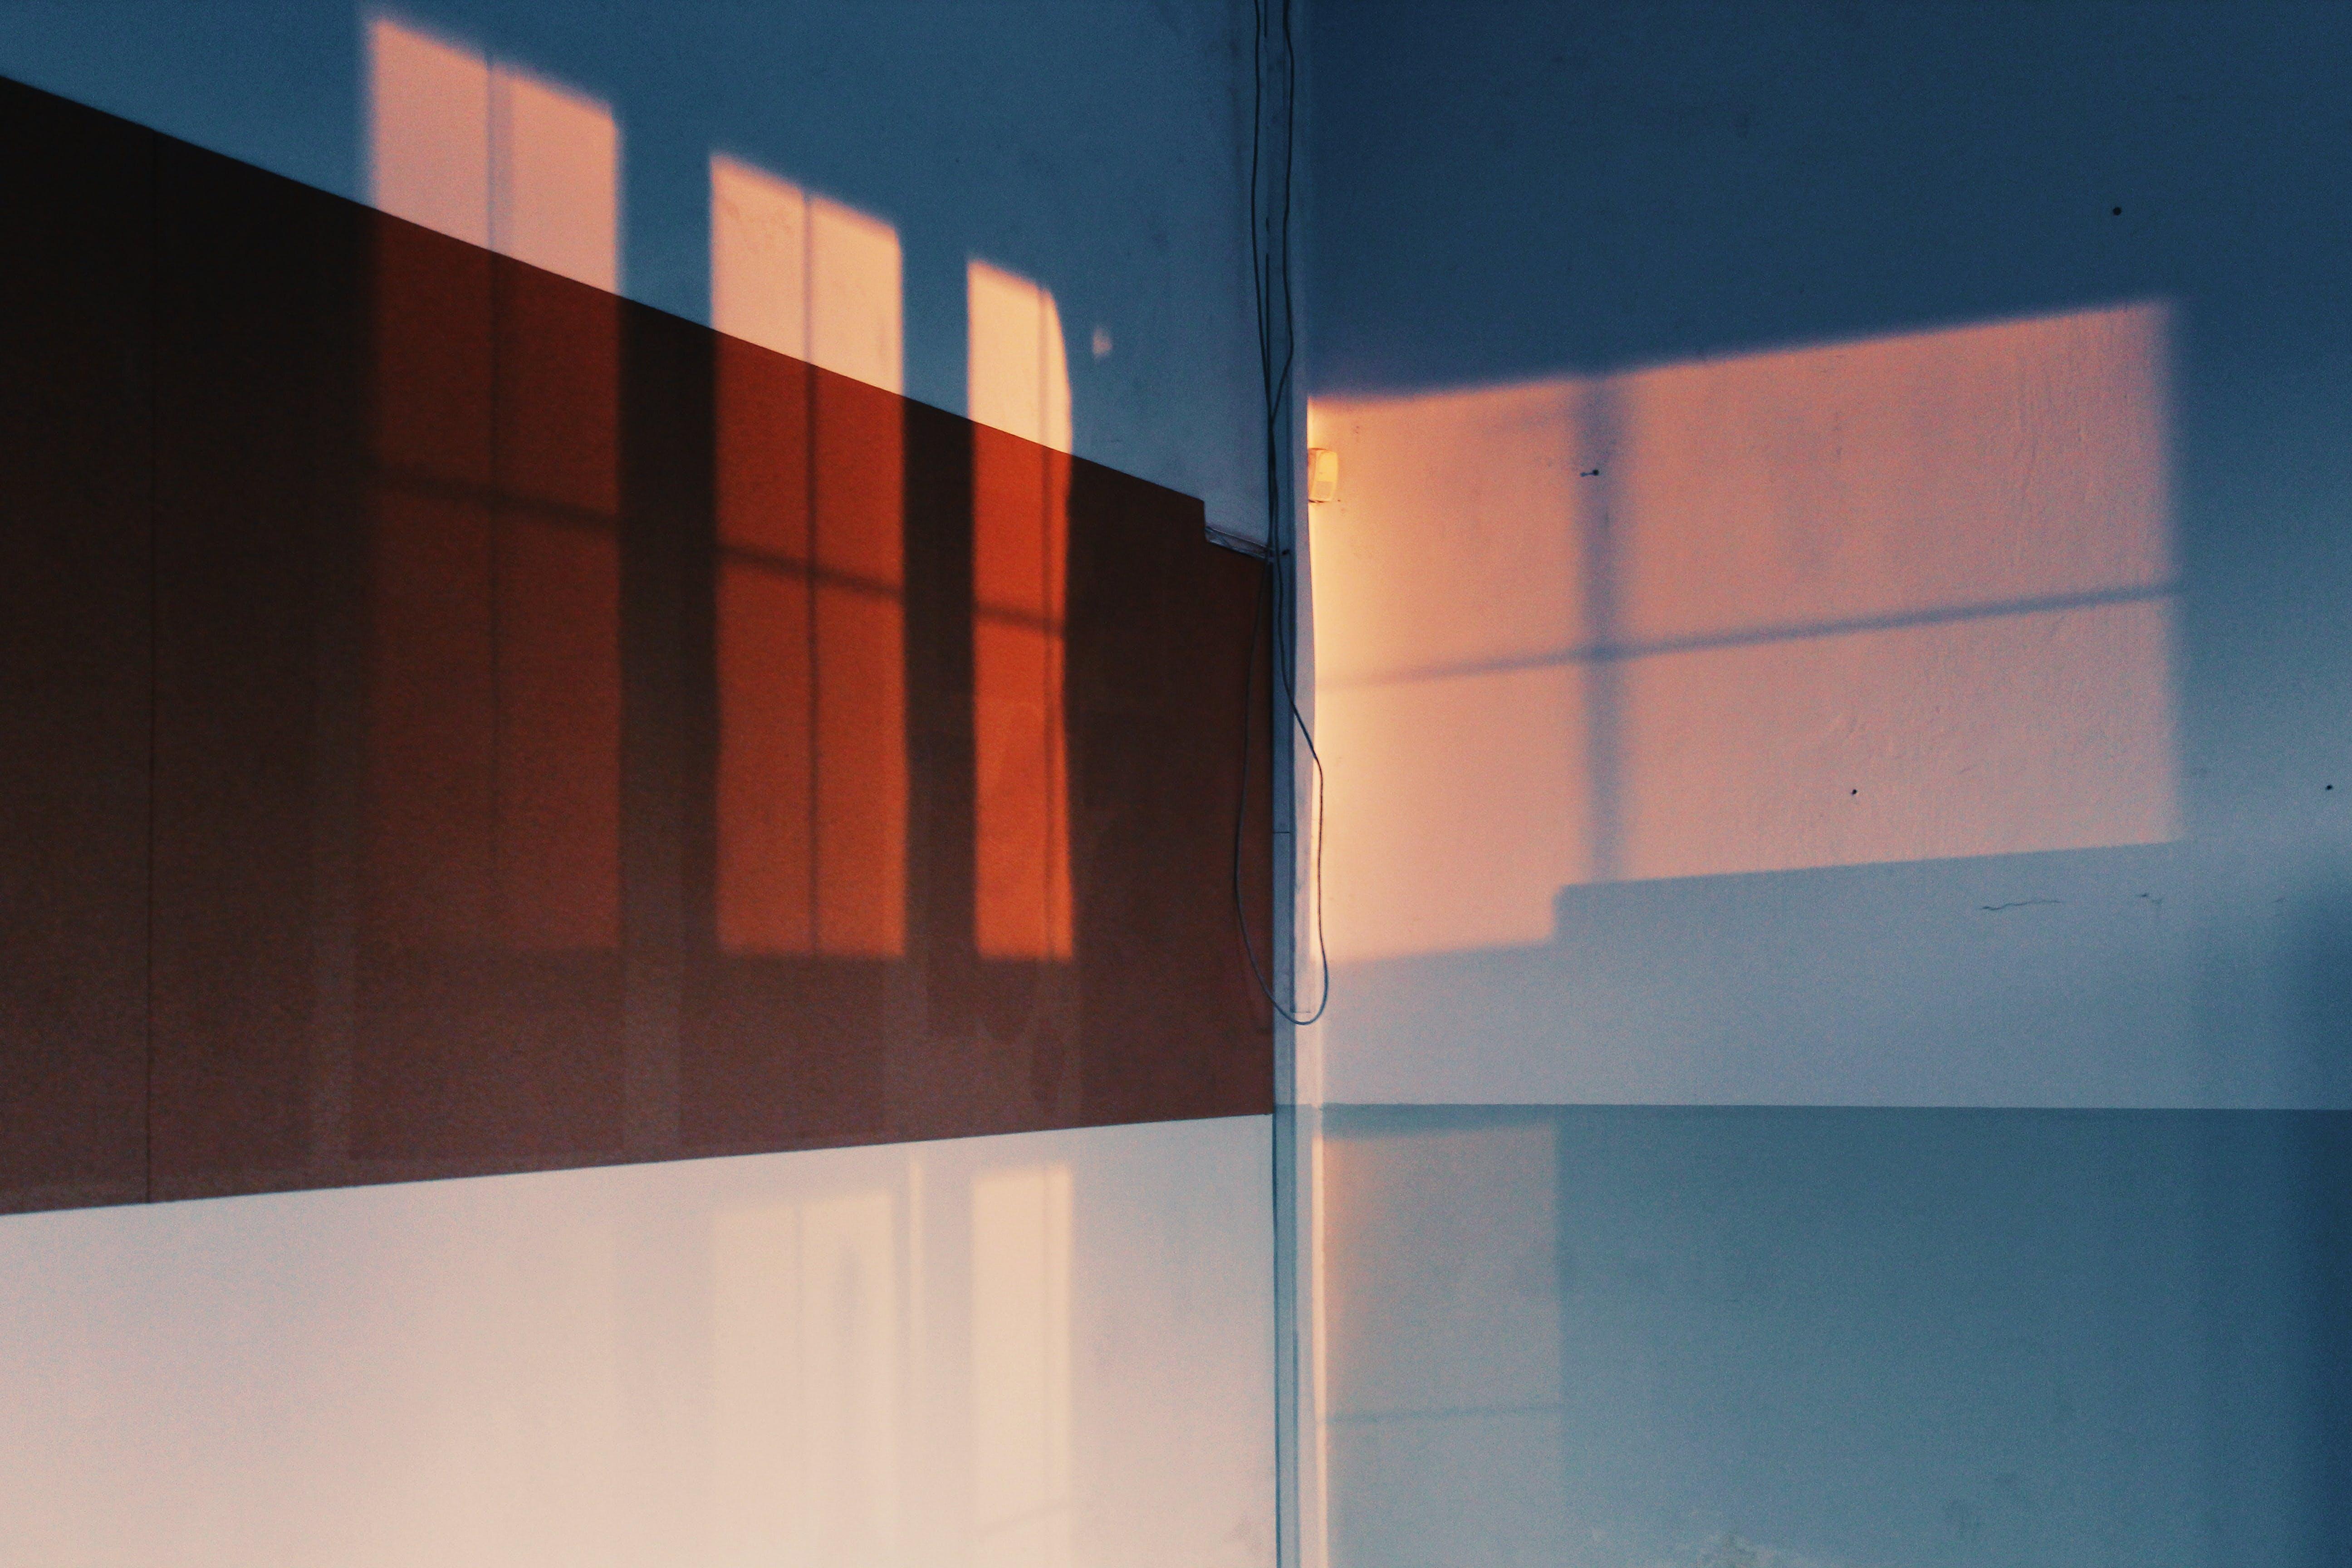 Reflection of Window on Wall